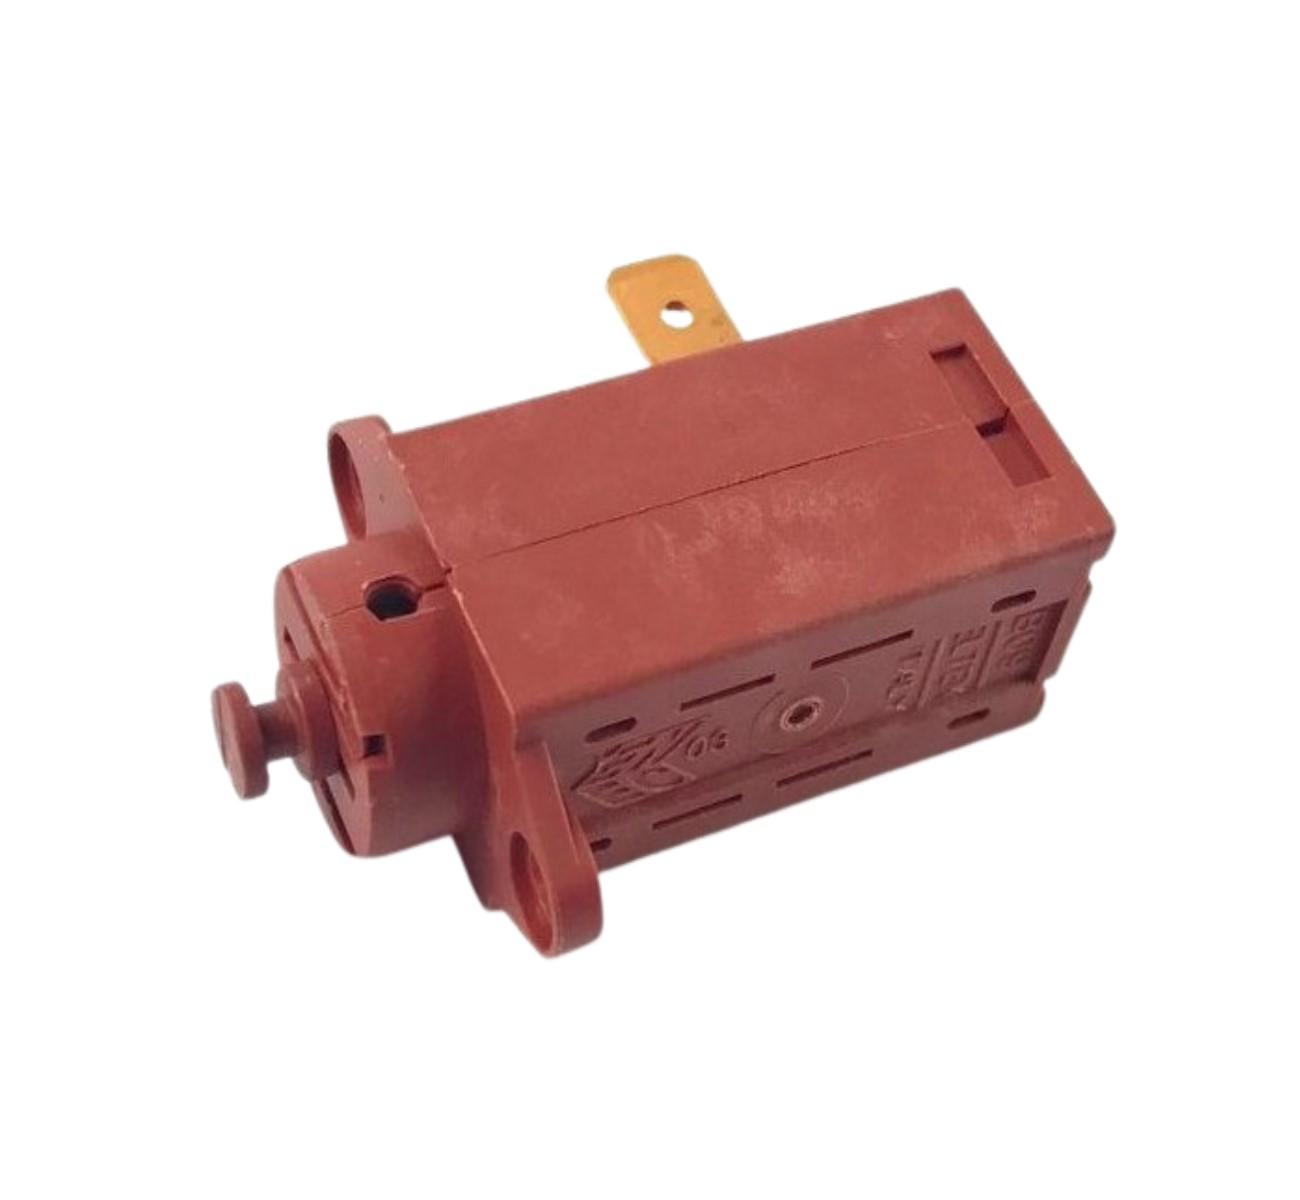 Termoatuador Colormaq 11Kg Lavadora Termo Atuador Original